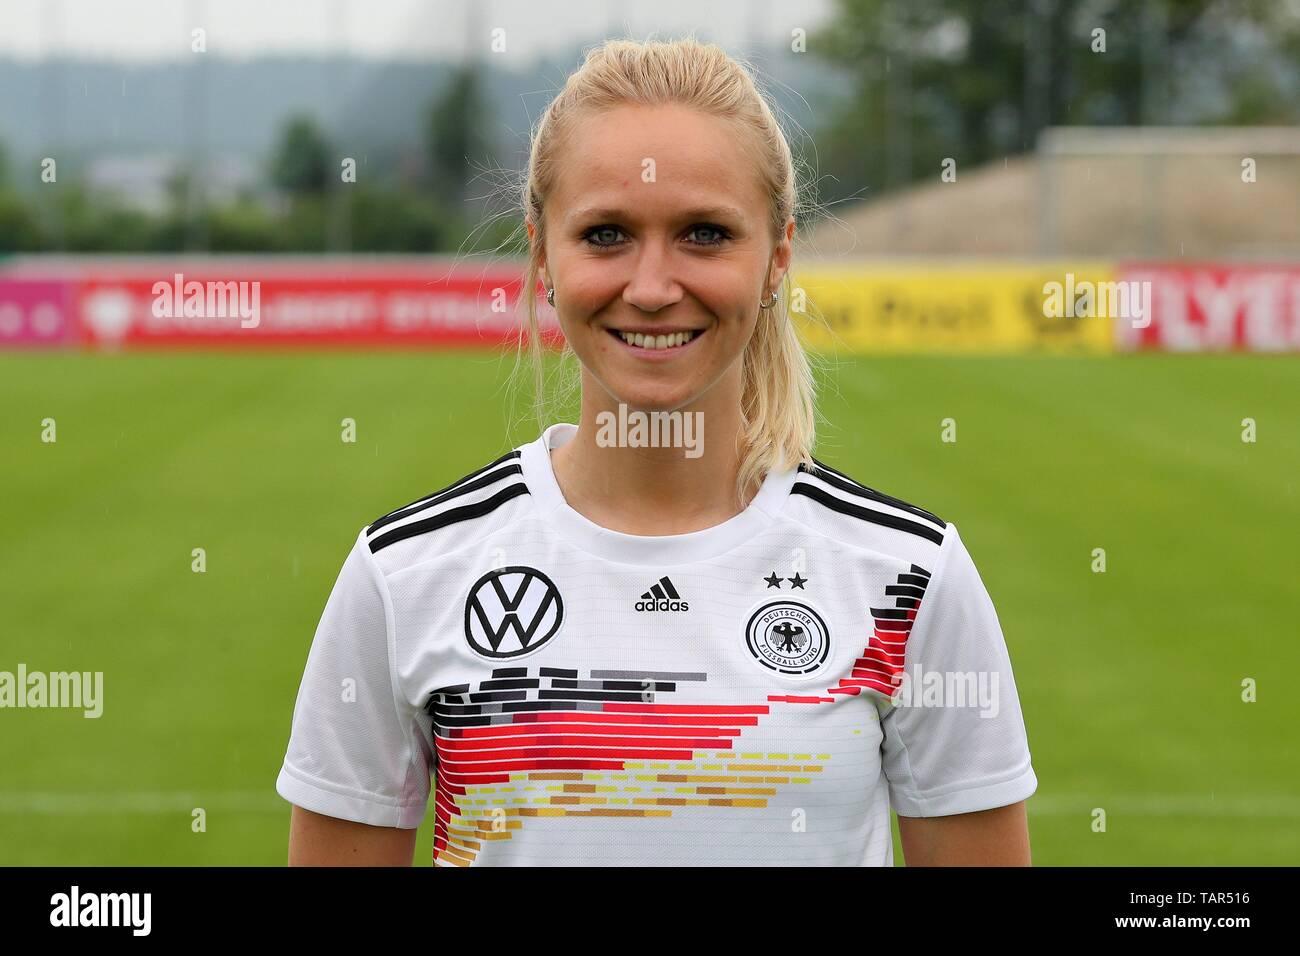 Grassau, Deutschland. 27th May, 2019. firo: 27.05.2019, football, women national team, DFB, portrait shooting, Turid Knaak, Germany, DFB, portrait, | usage worldwide Credit: dpa/Alamy Live News - Stock Image